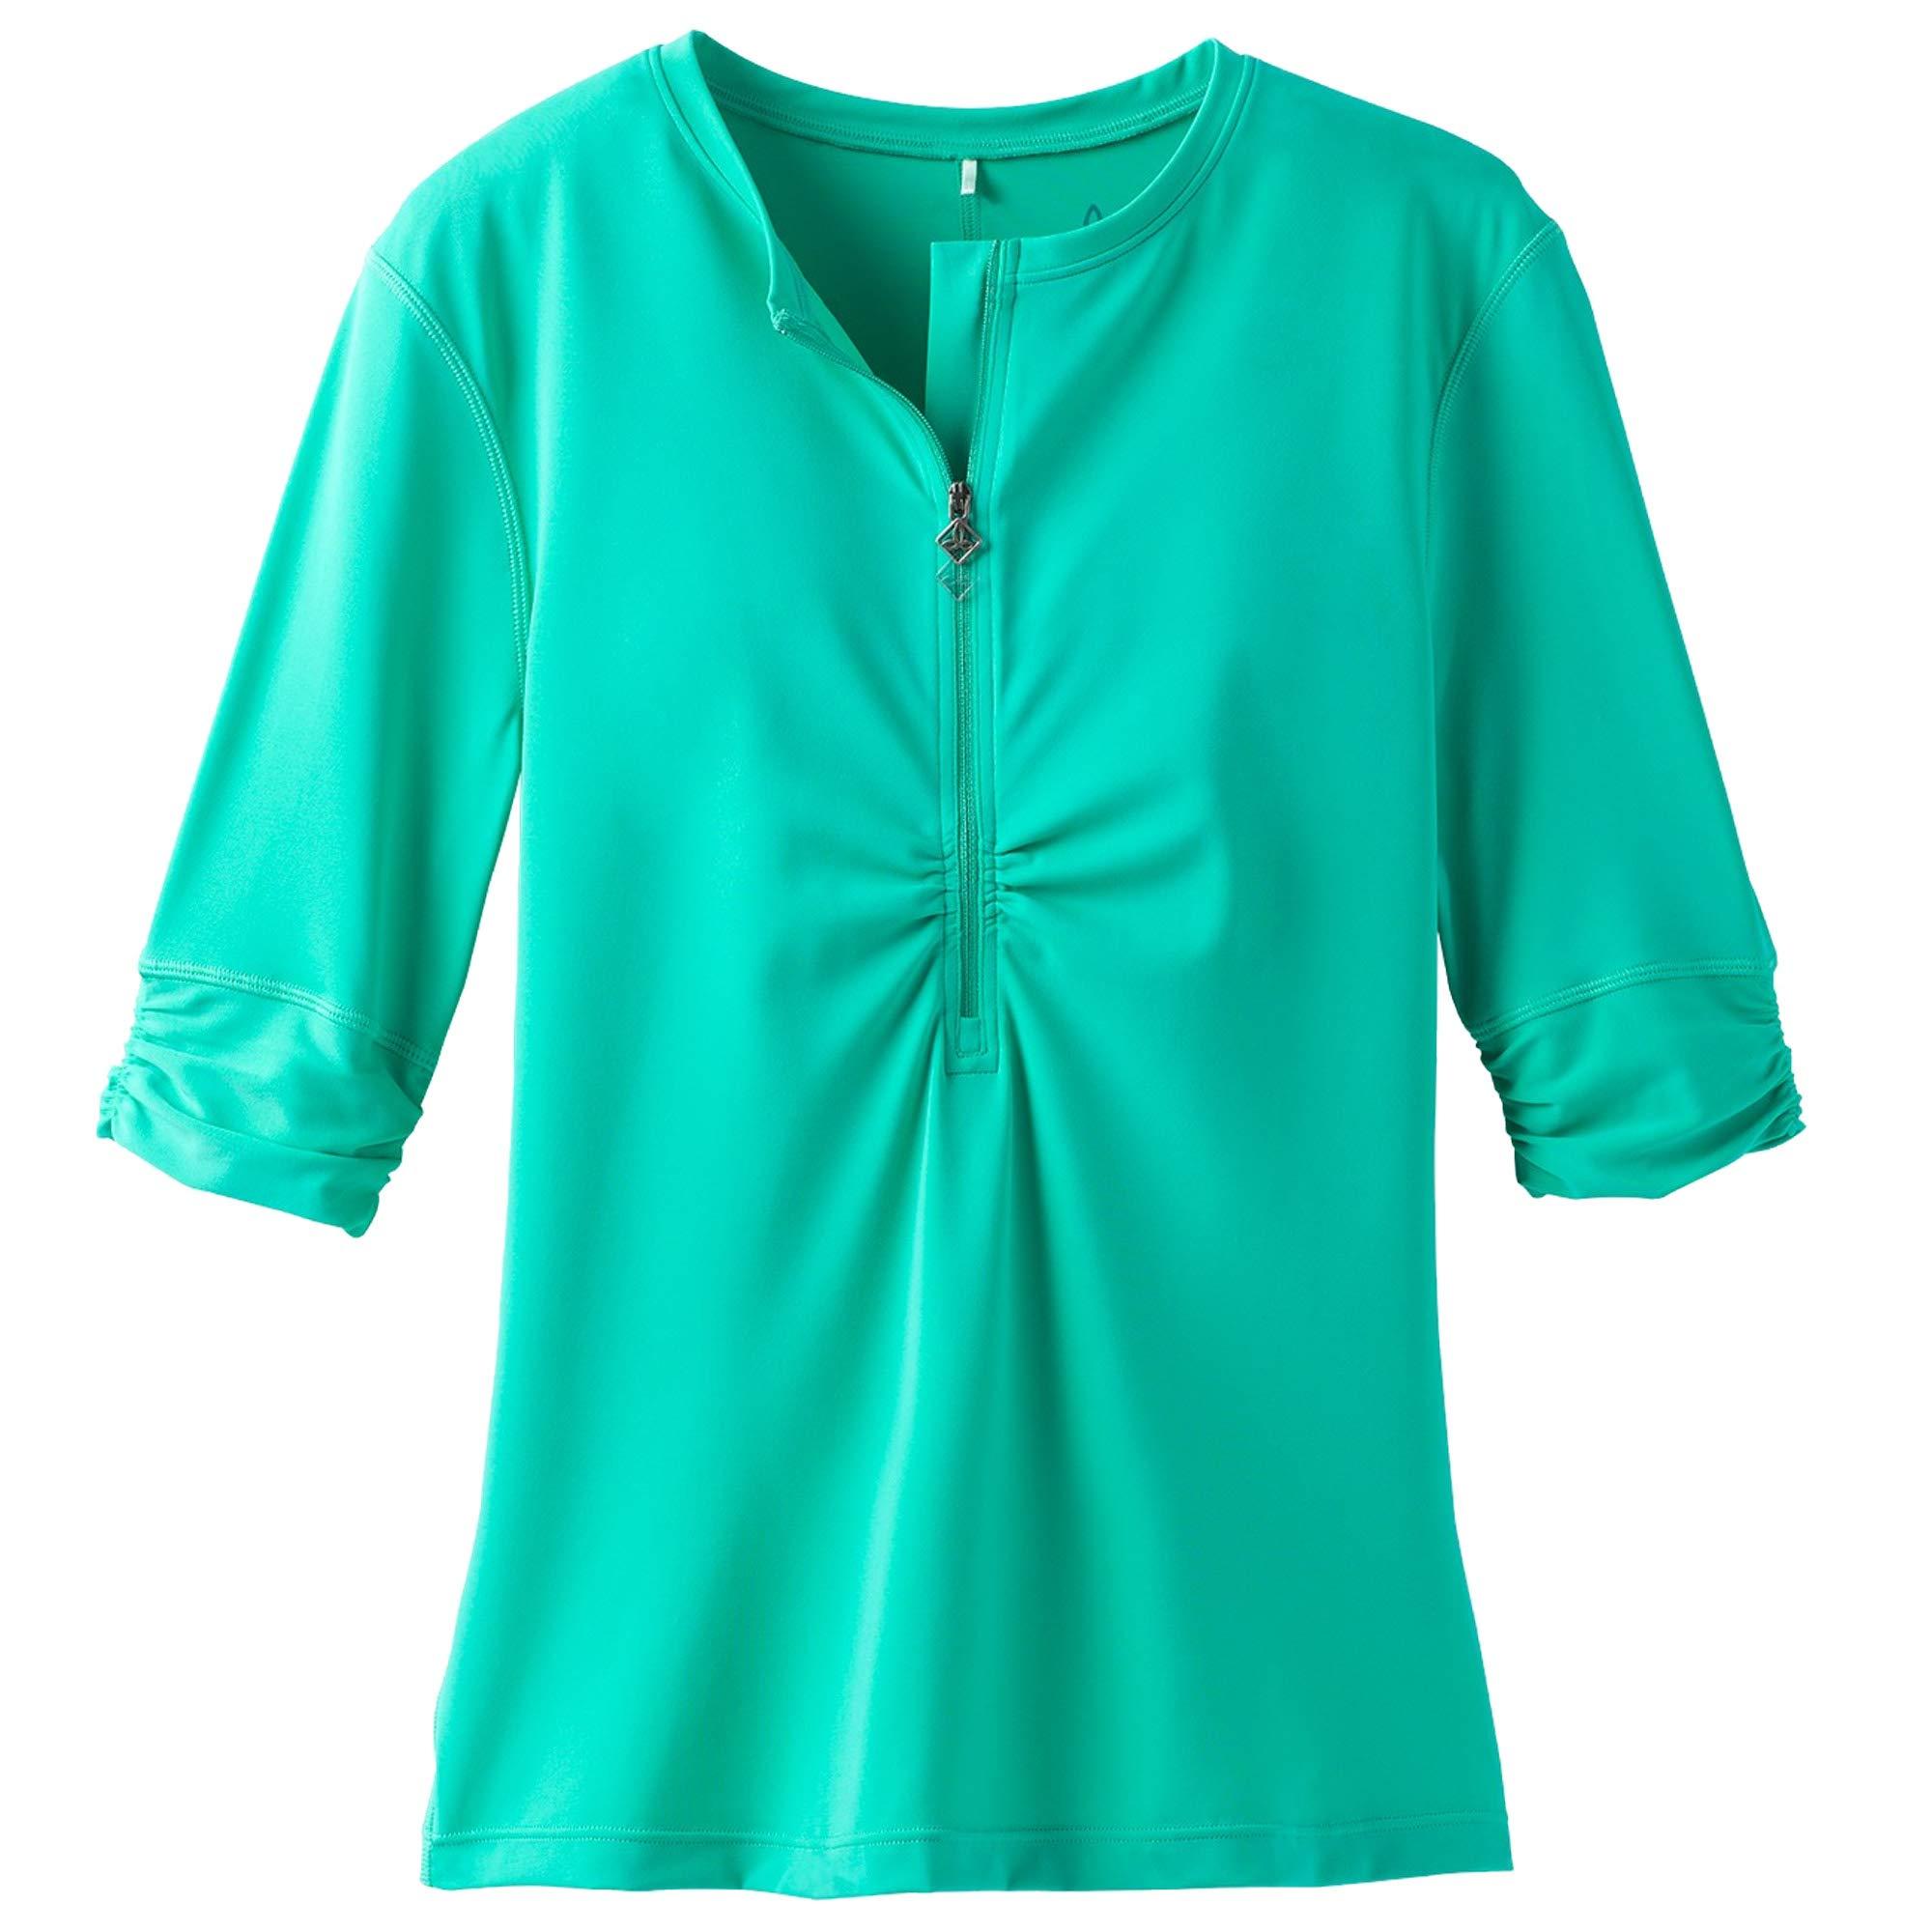 prAna Women's Perry Short Sleeve Sun Top, Aqua Wave, Medium